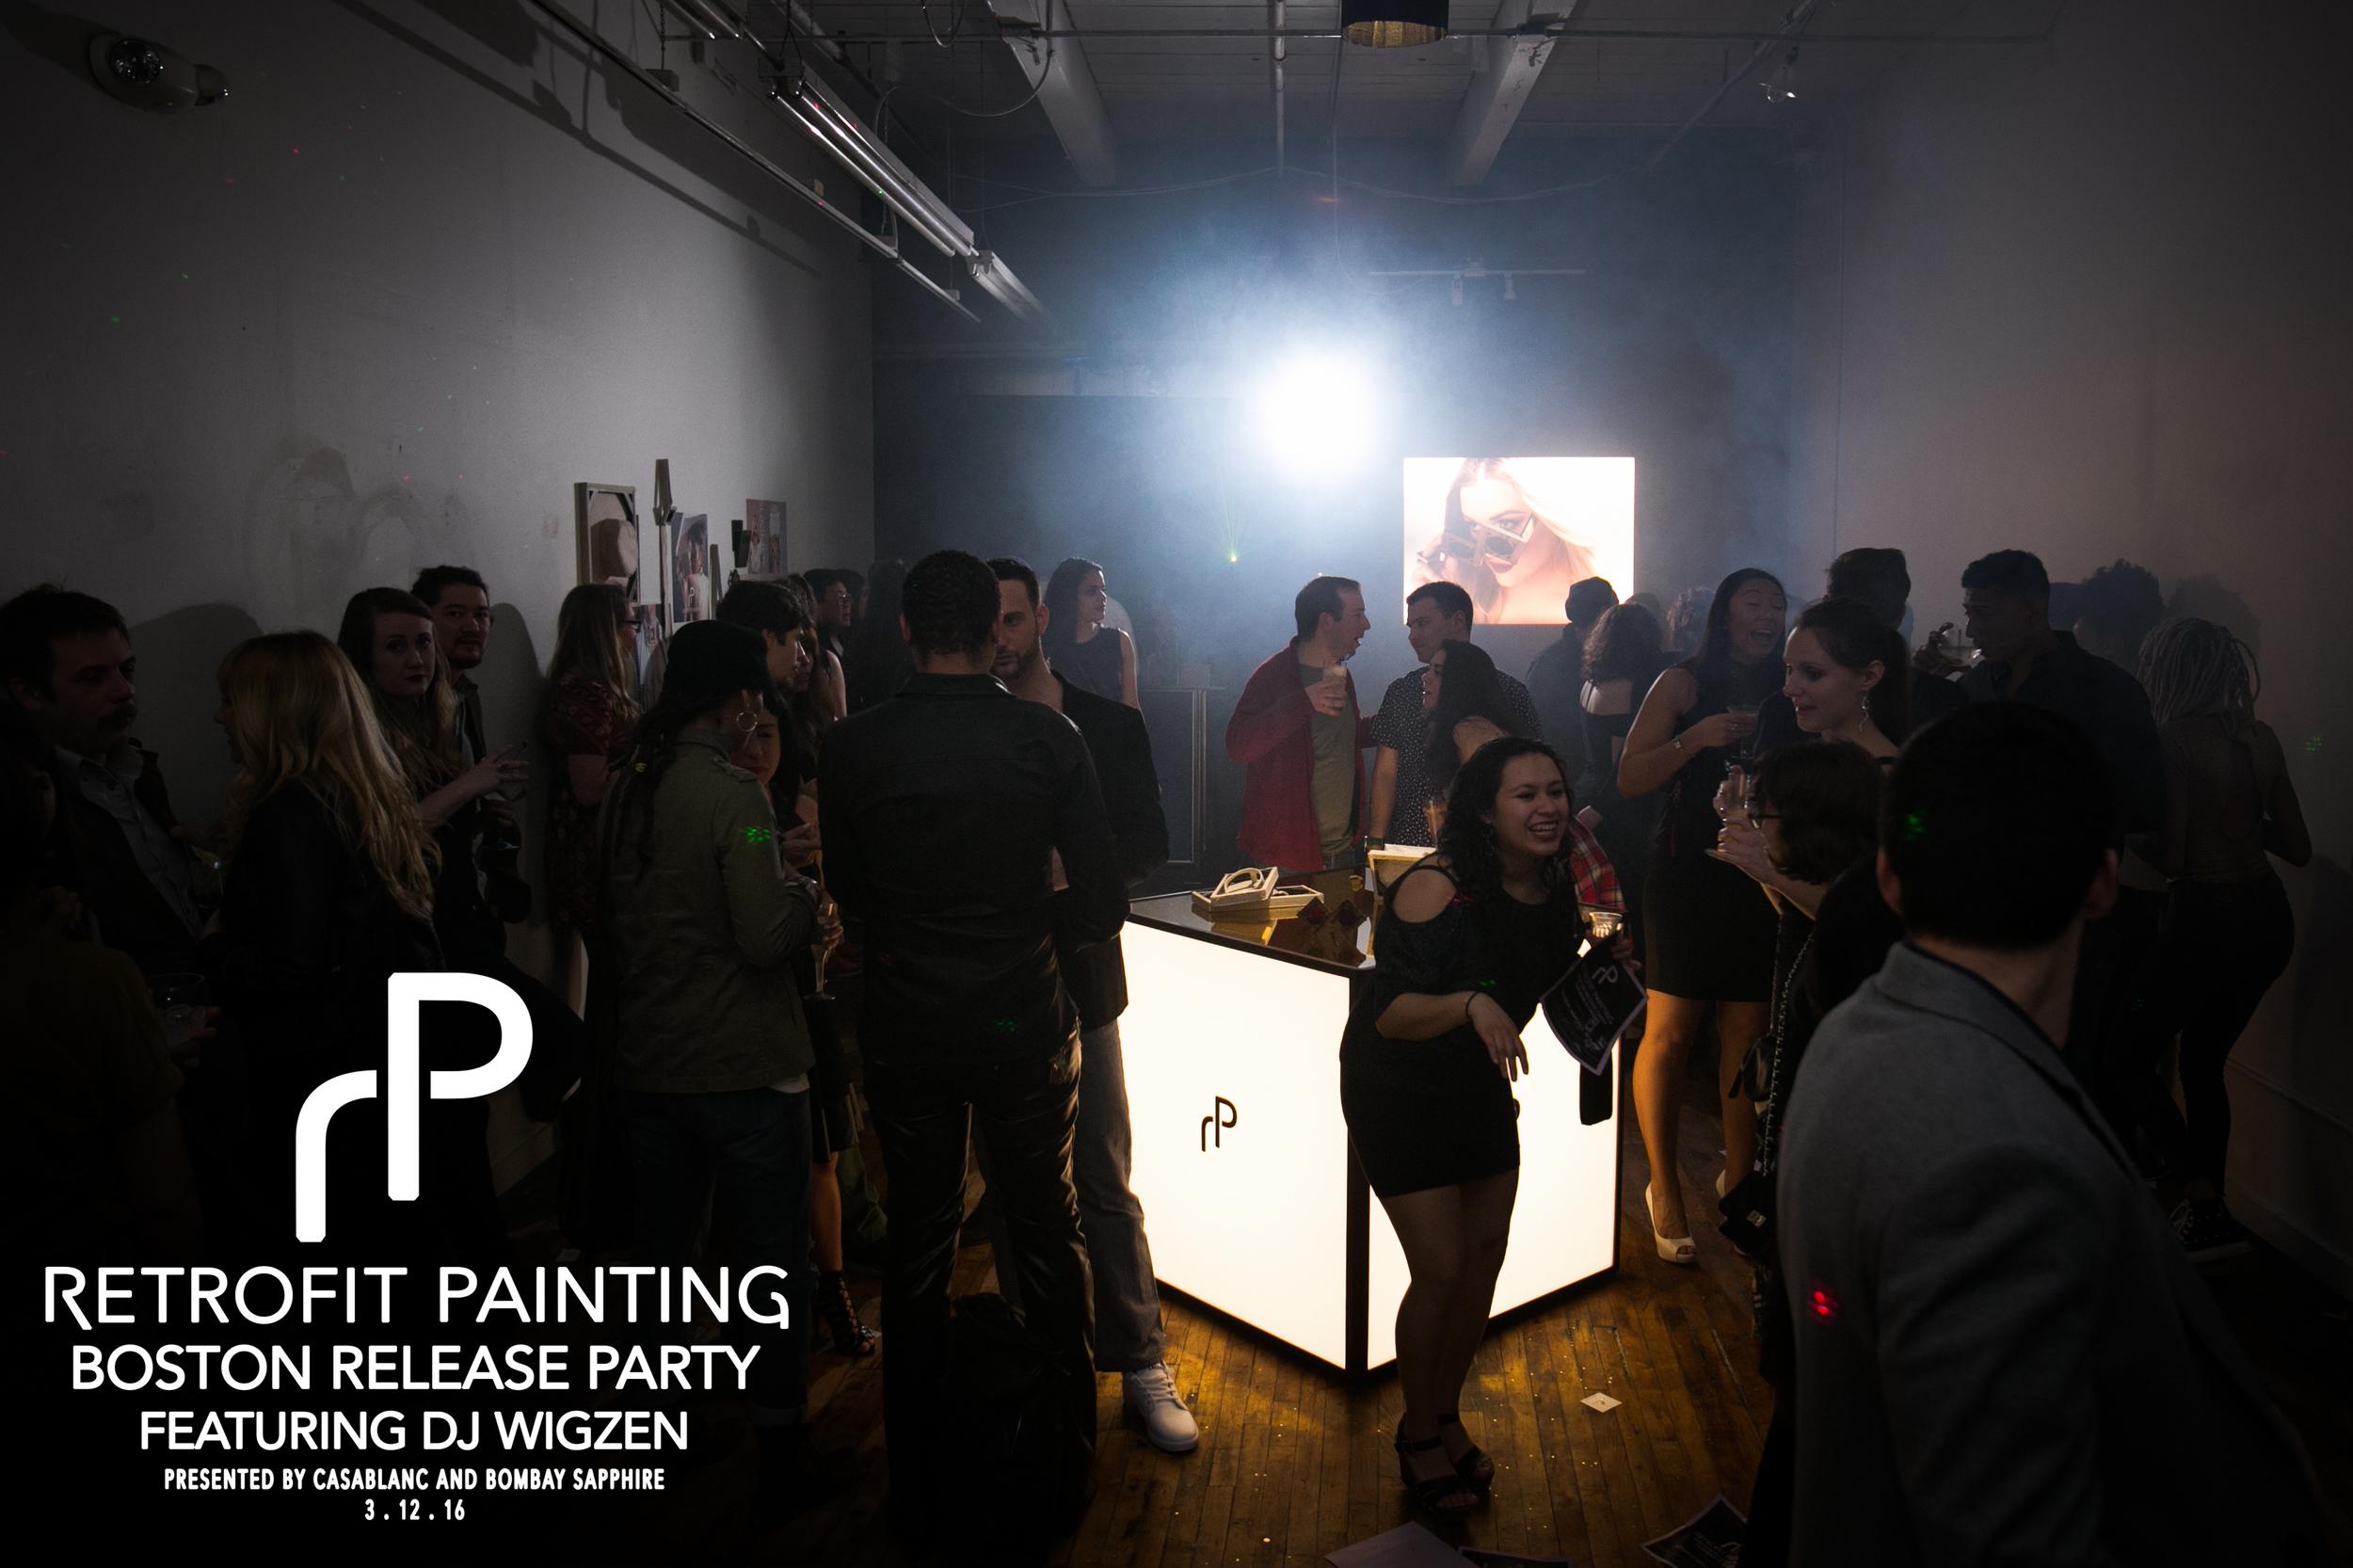 Retrofit Painting Boston Release Party 0169.jpg